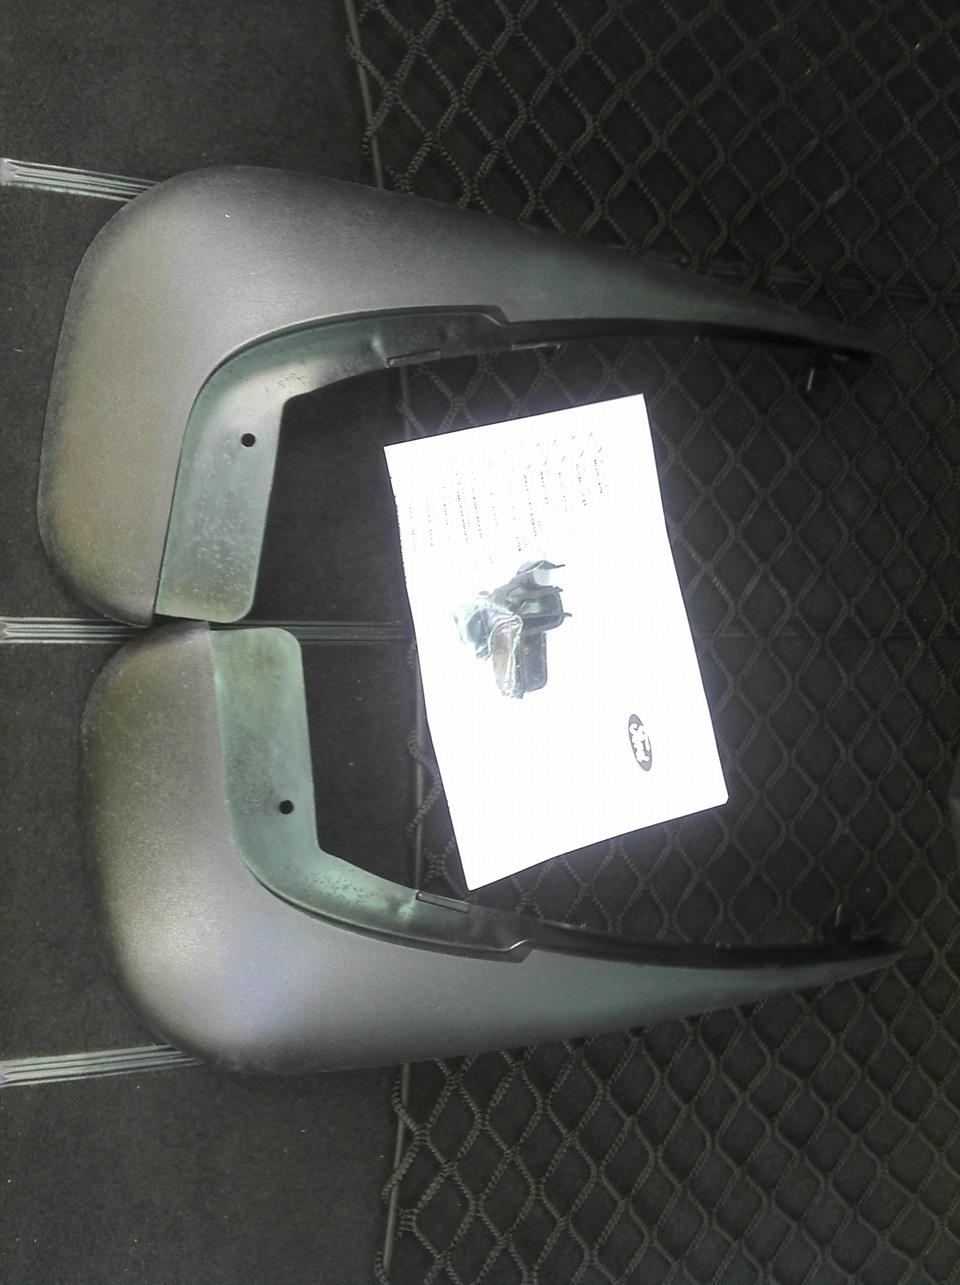 Оригинальные брызговики на форд мондео фото 456-11